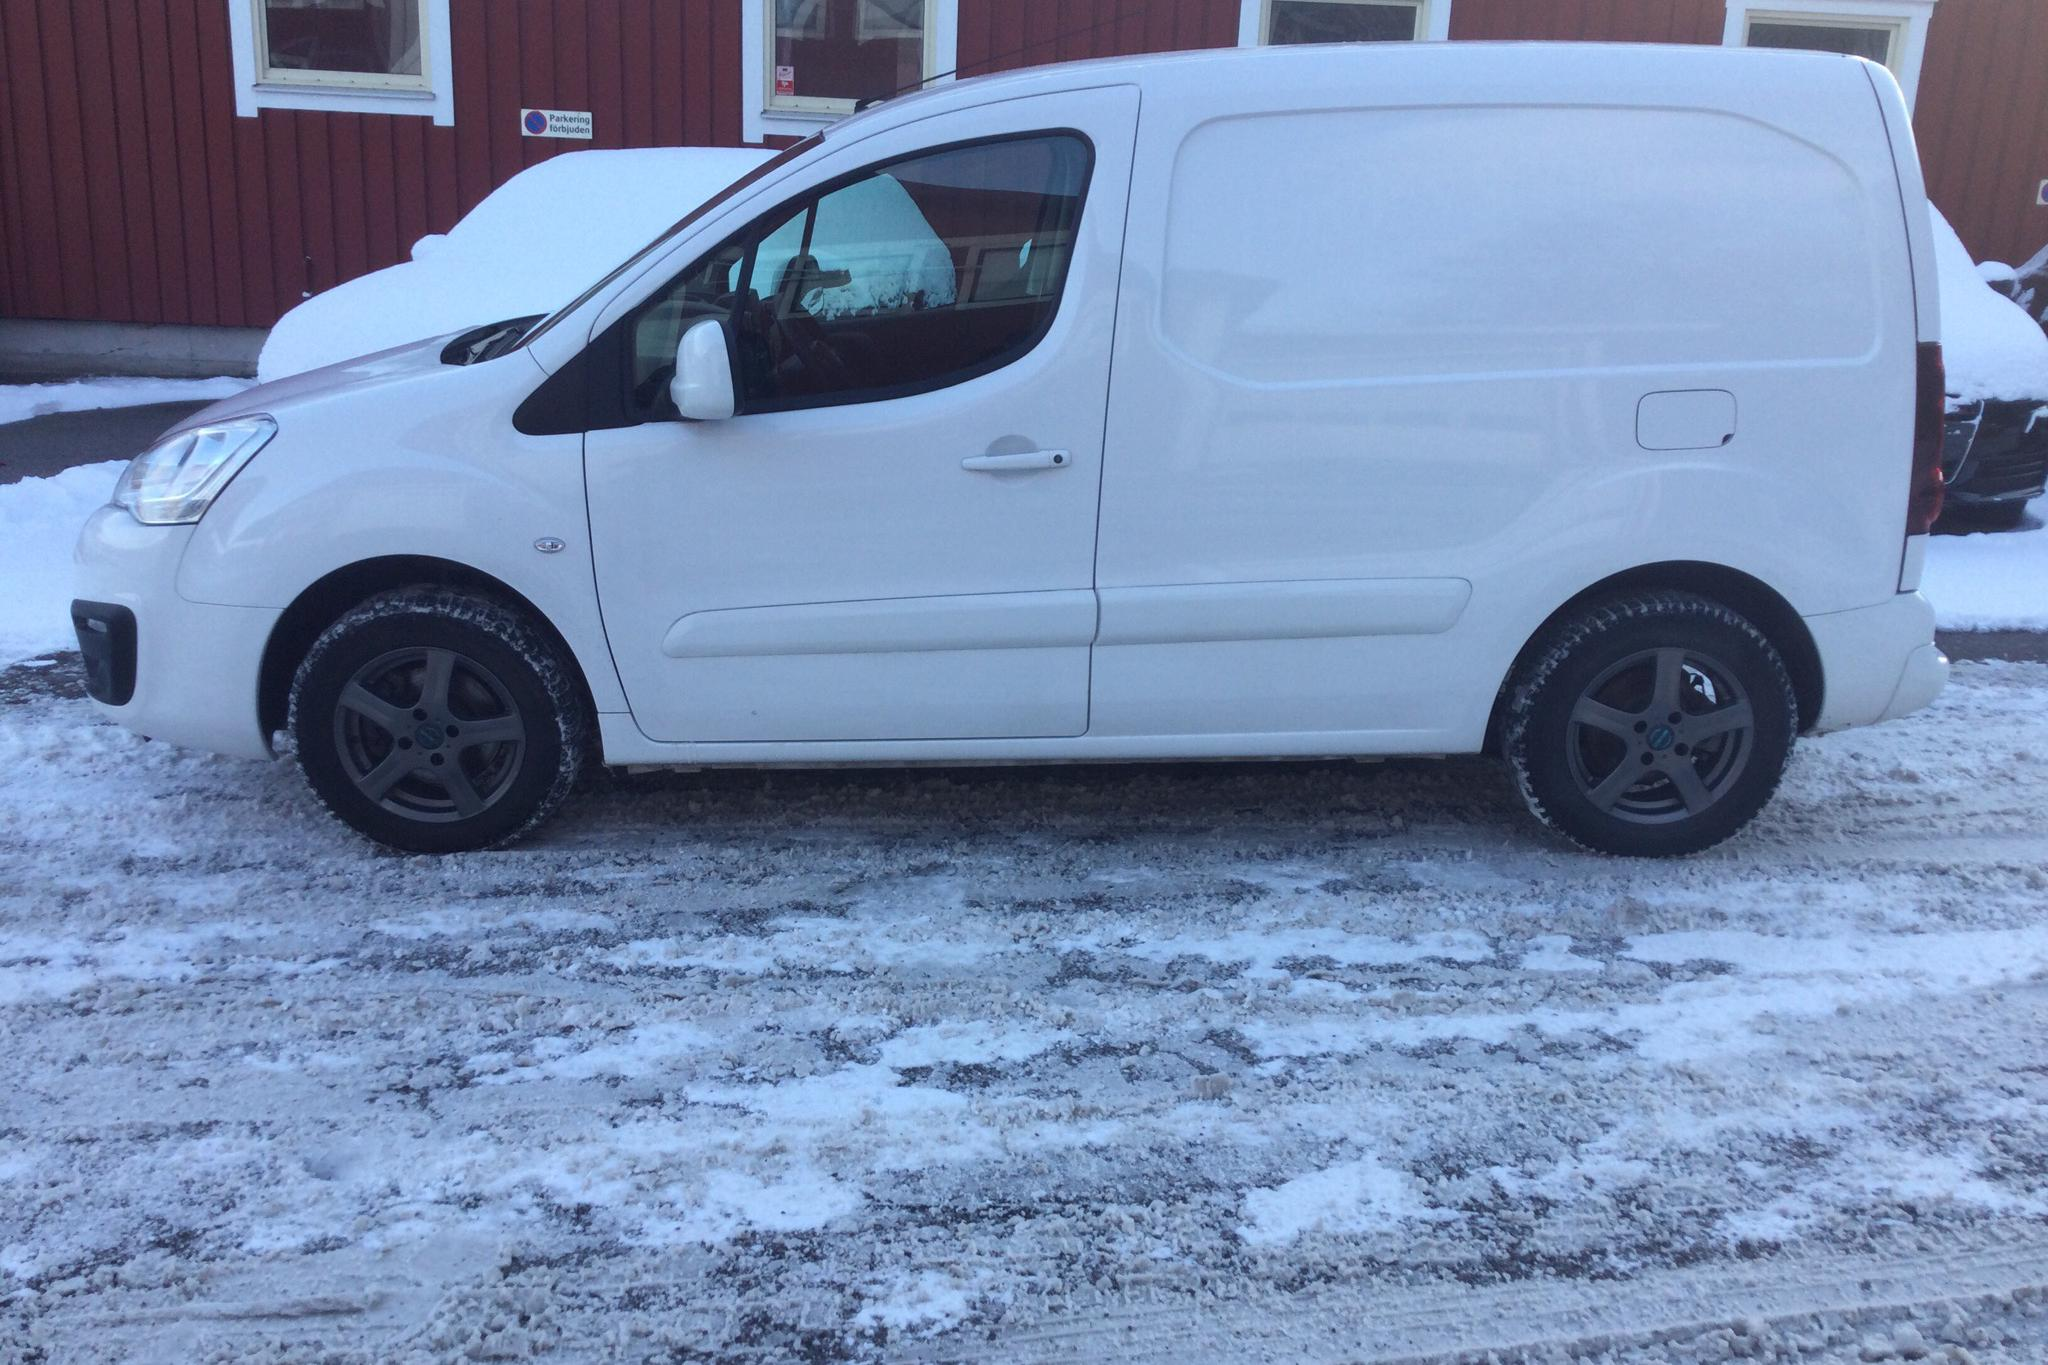 Citroen Berlingo 1.6 BlueHDi Skåp (100hk) - 2 831 mil - Manuell - vit - 2019